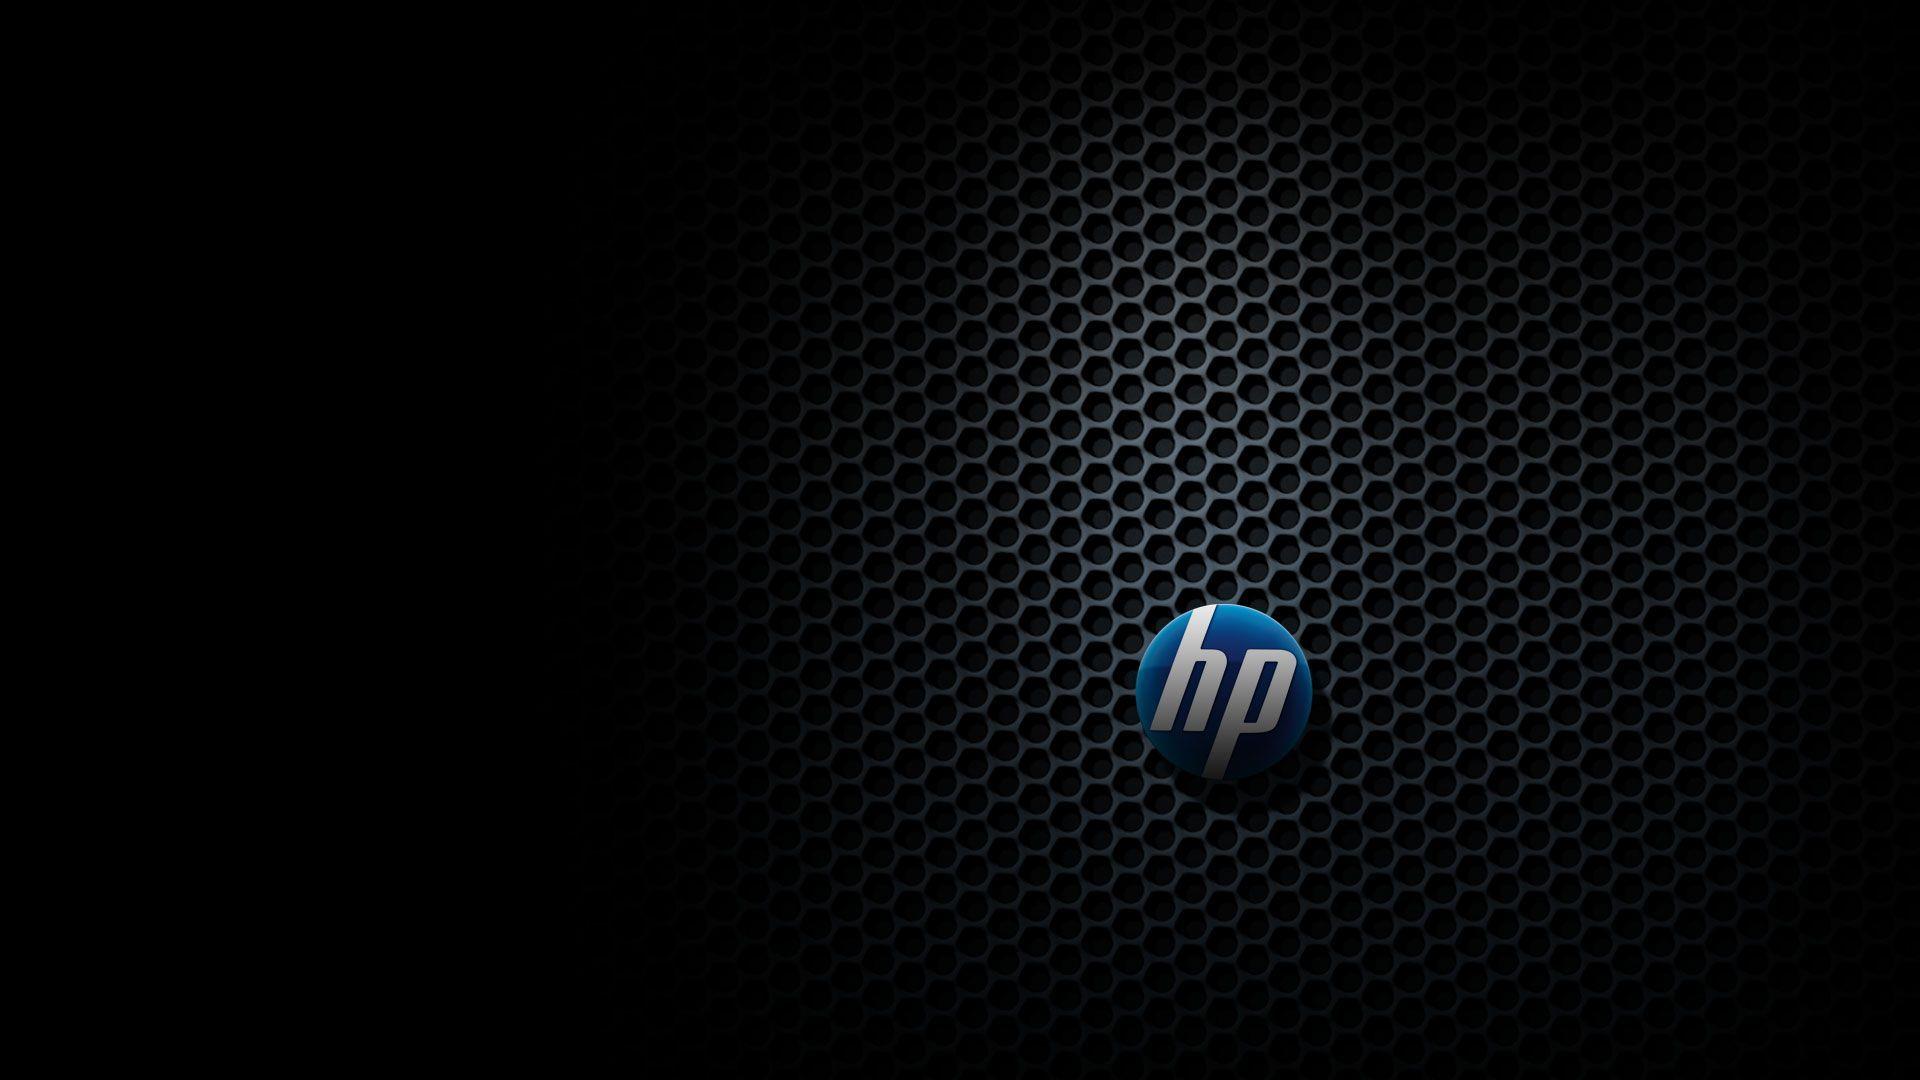 PC Picture